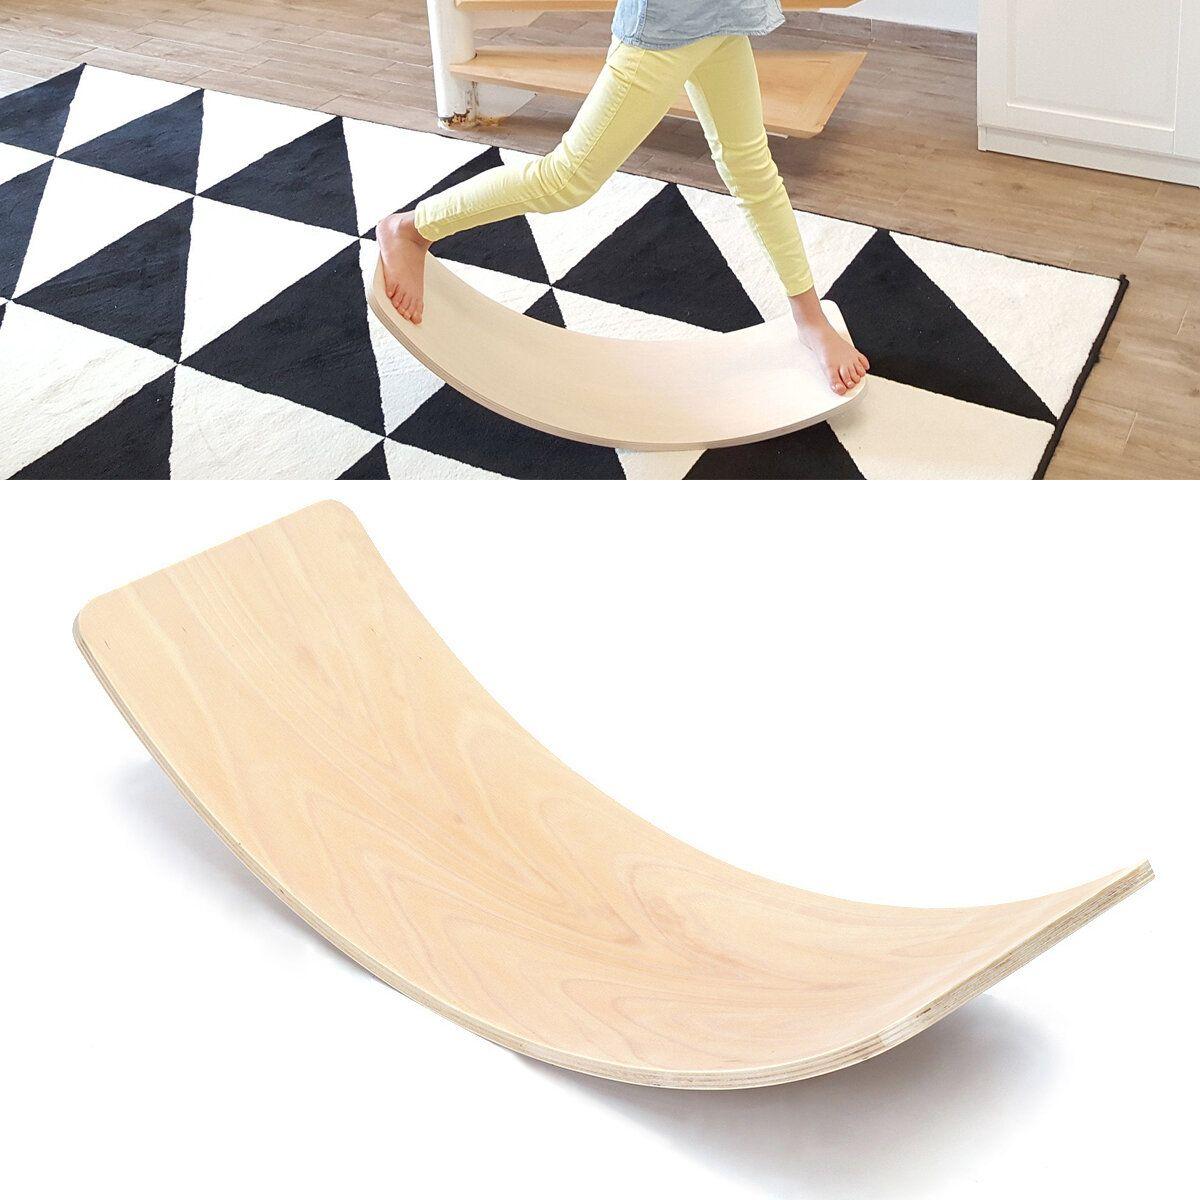 36 Inch Kids Wooden Curved Balance Boards Toddler Children Fitness Bridge Toys